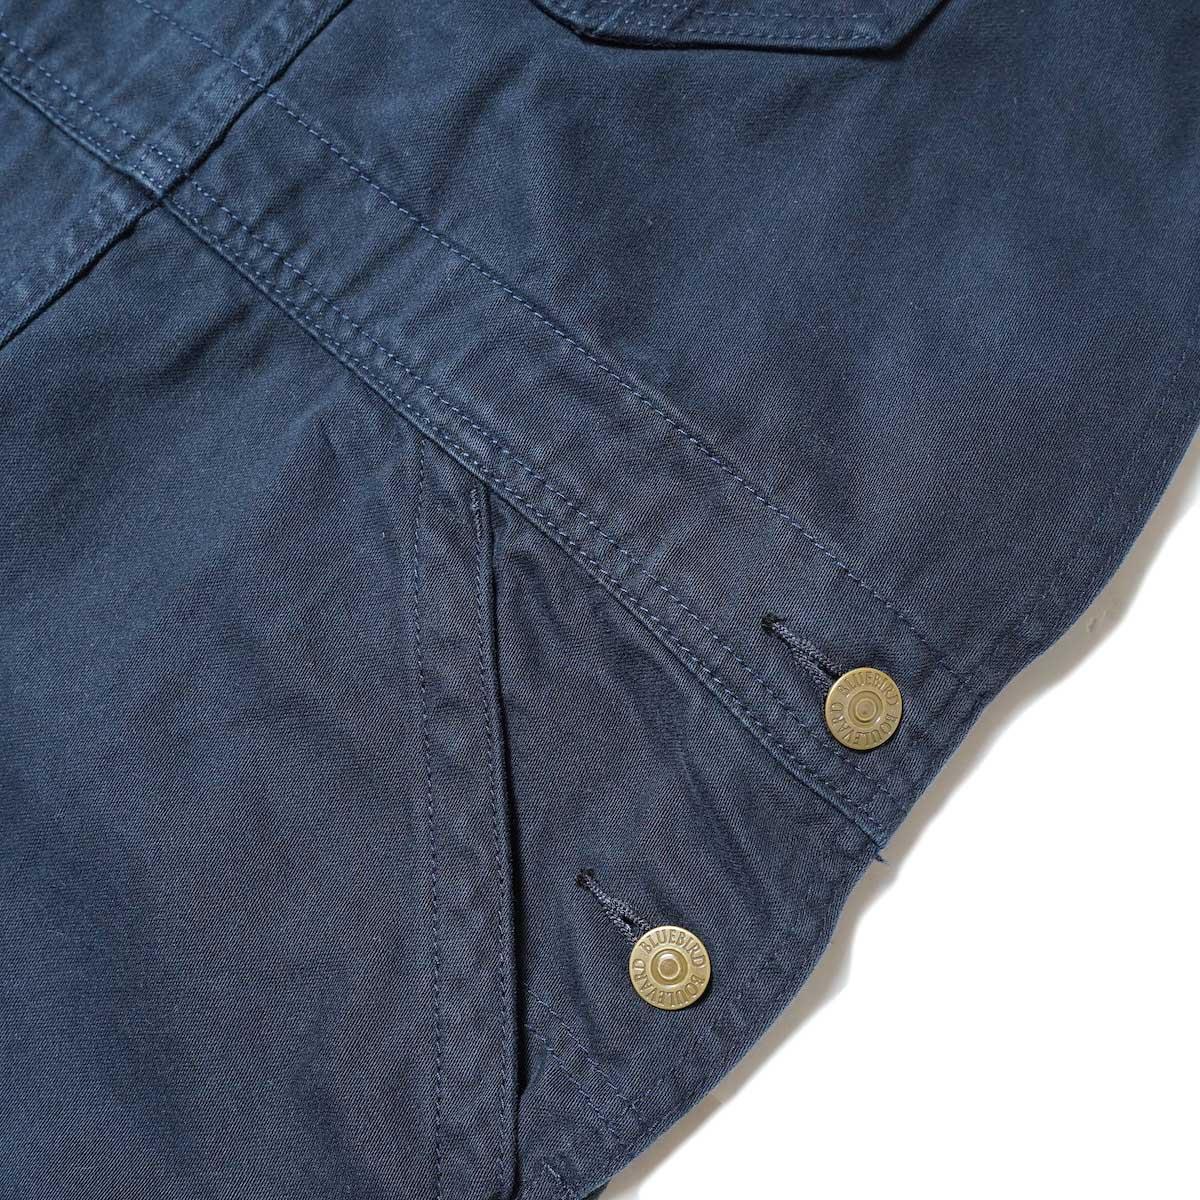 BLUEBIRD BOULEVARD / Classic Warm Worker Satin Jumper Dress (Navy) サイドポケット